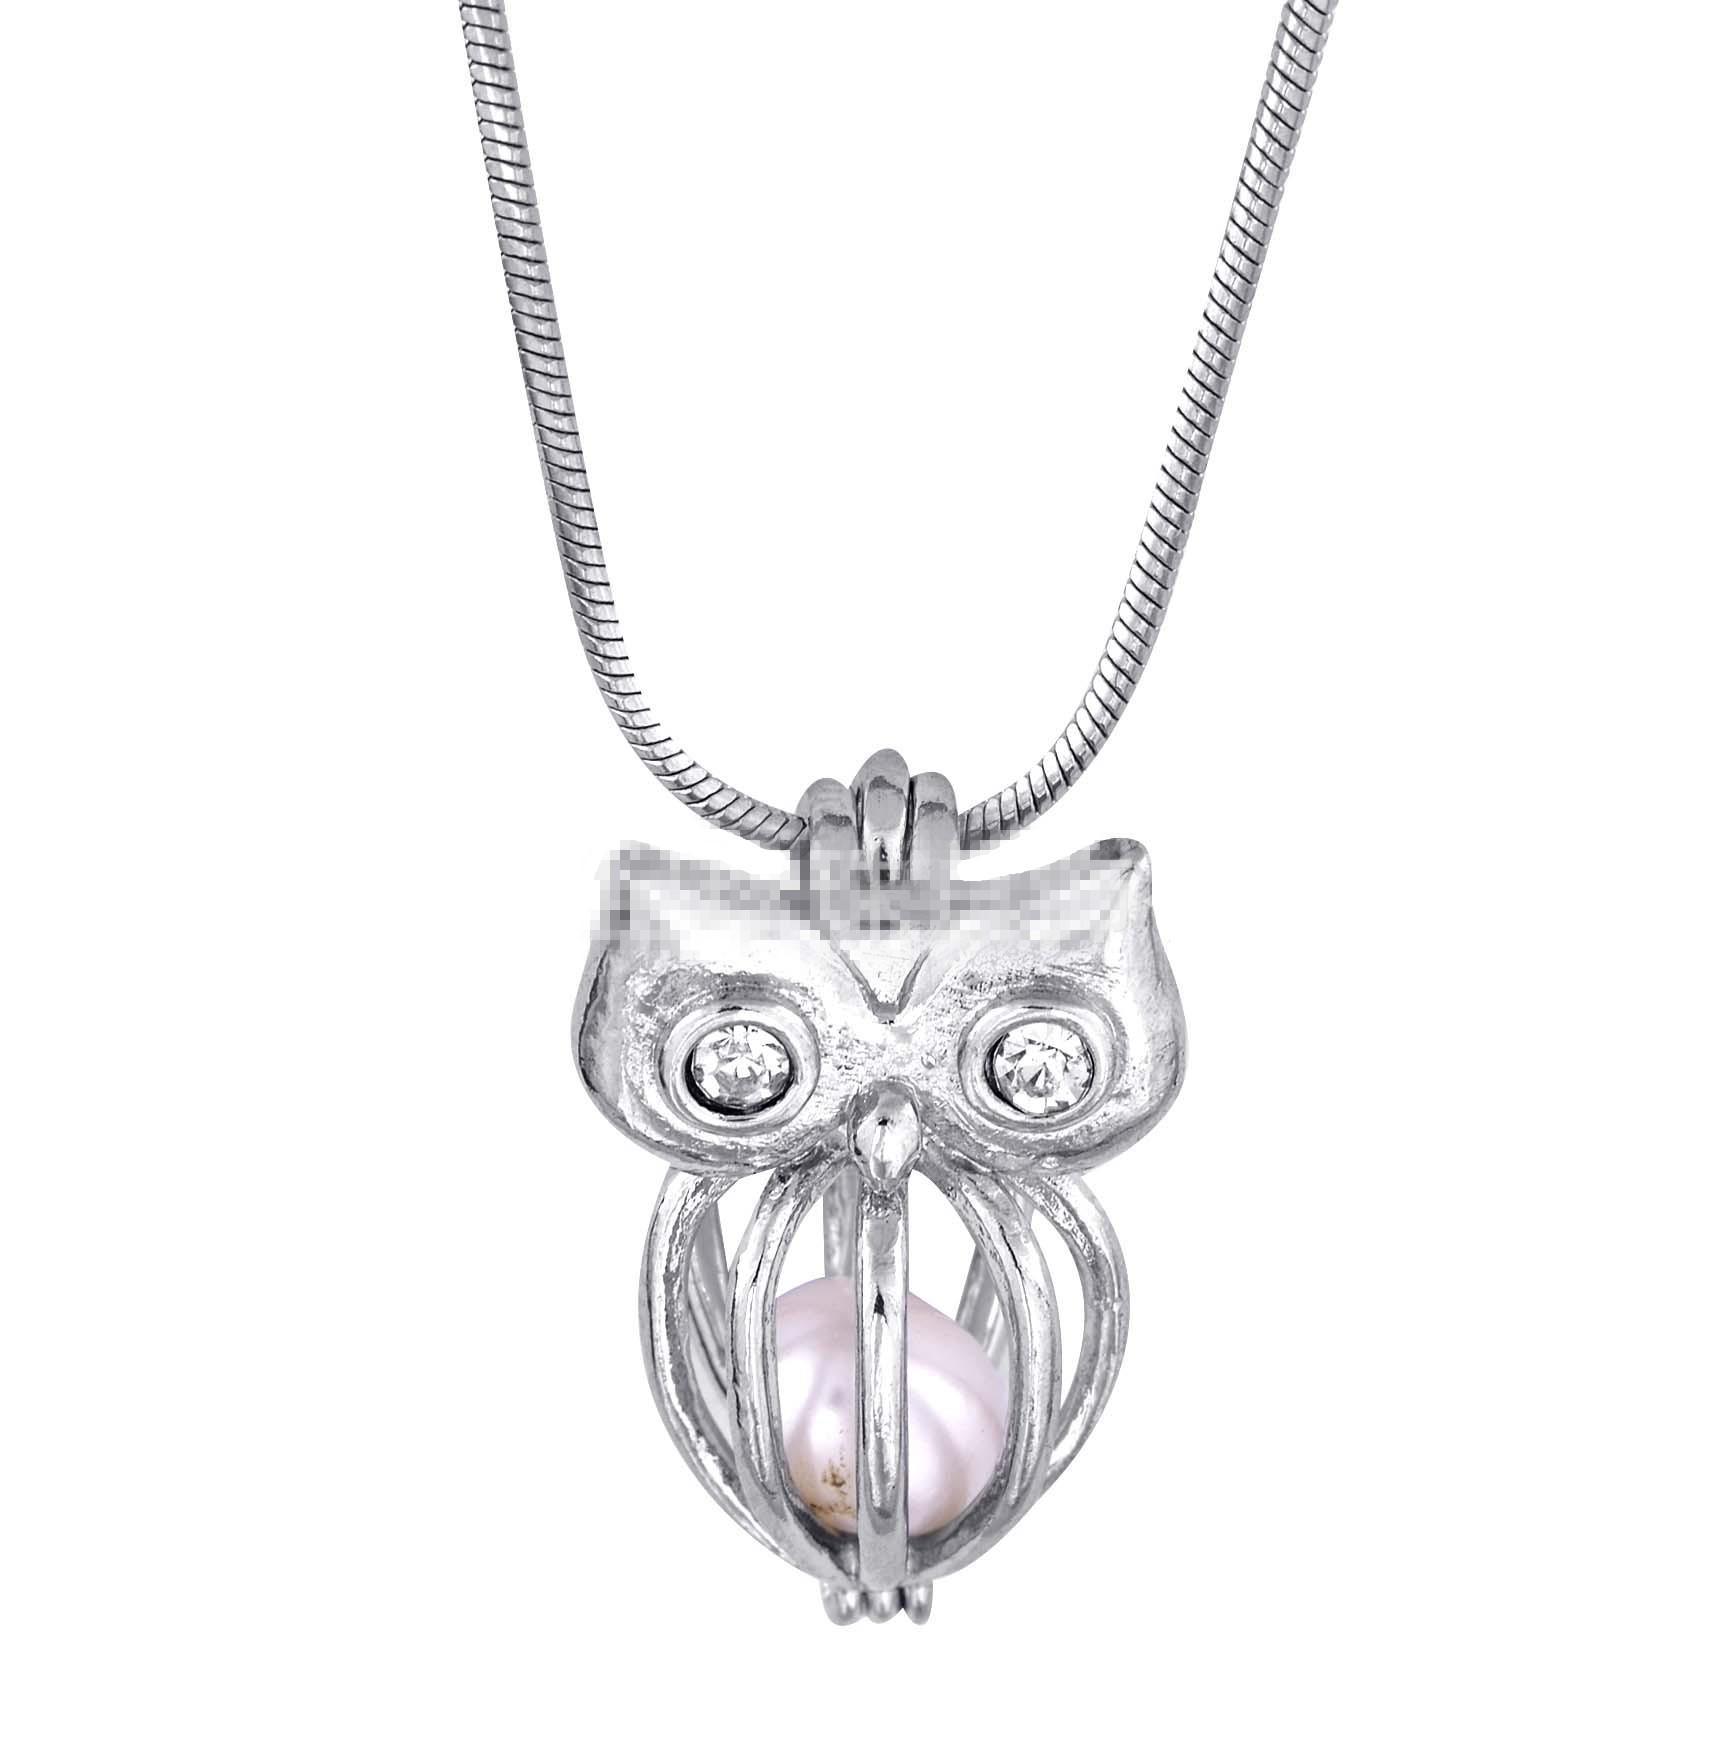 75 Estilos de perlas de amor Moda deseo perla / gema Stock 18kgp locket jaulas colgantes, collar de perlas de bricolaje colgantes del encanto montajes /